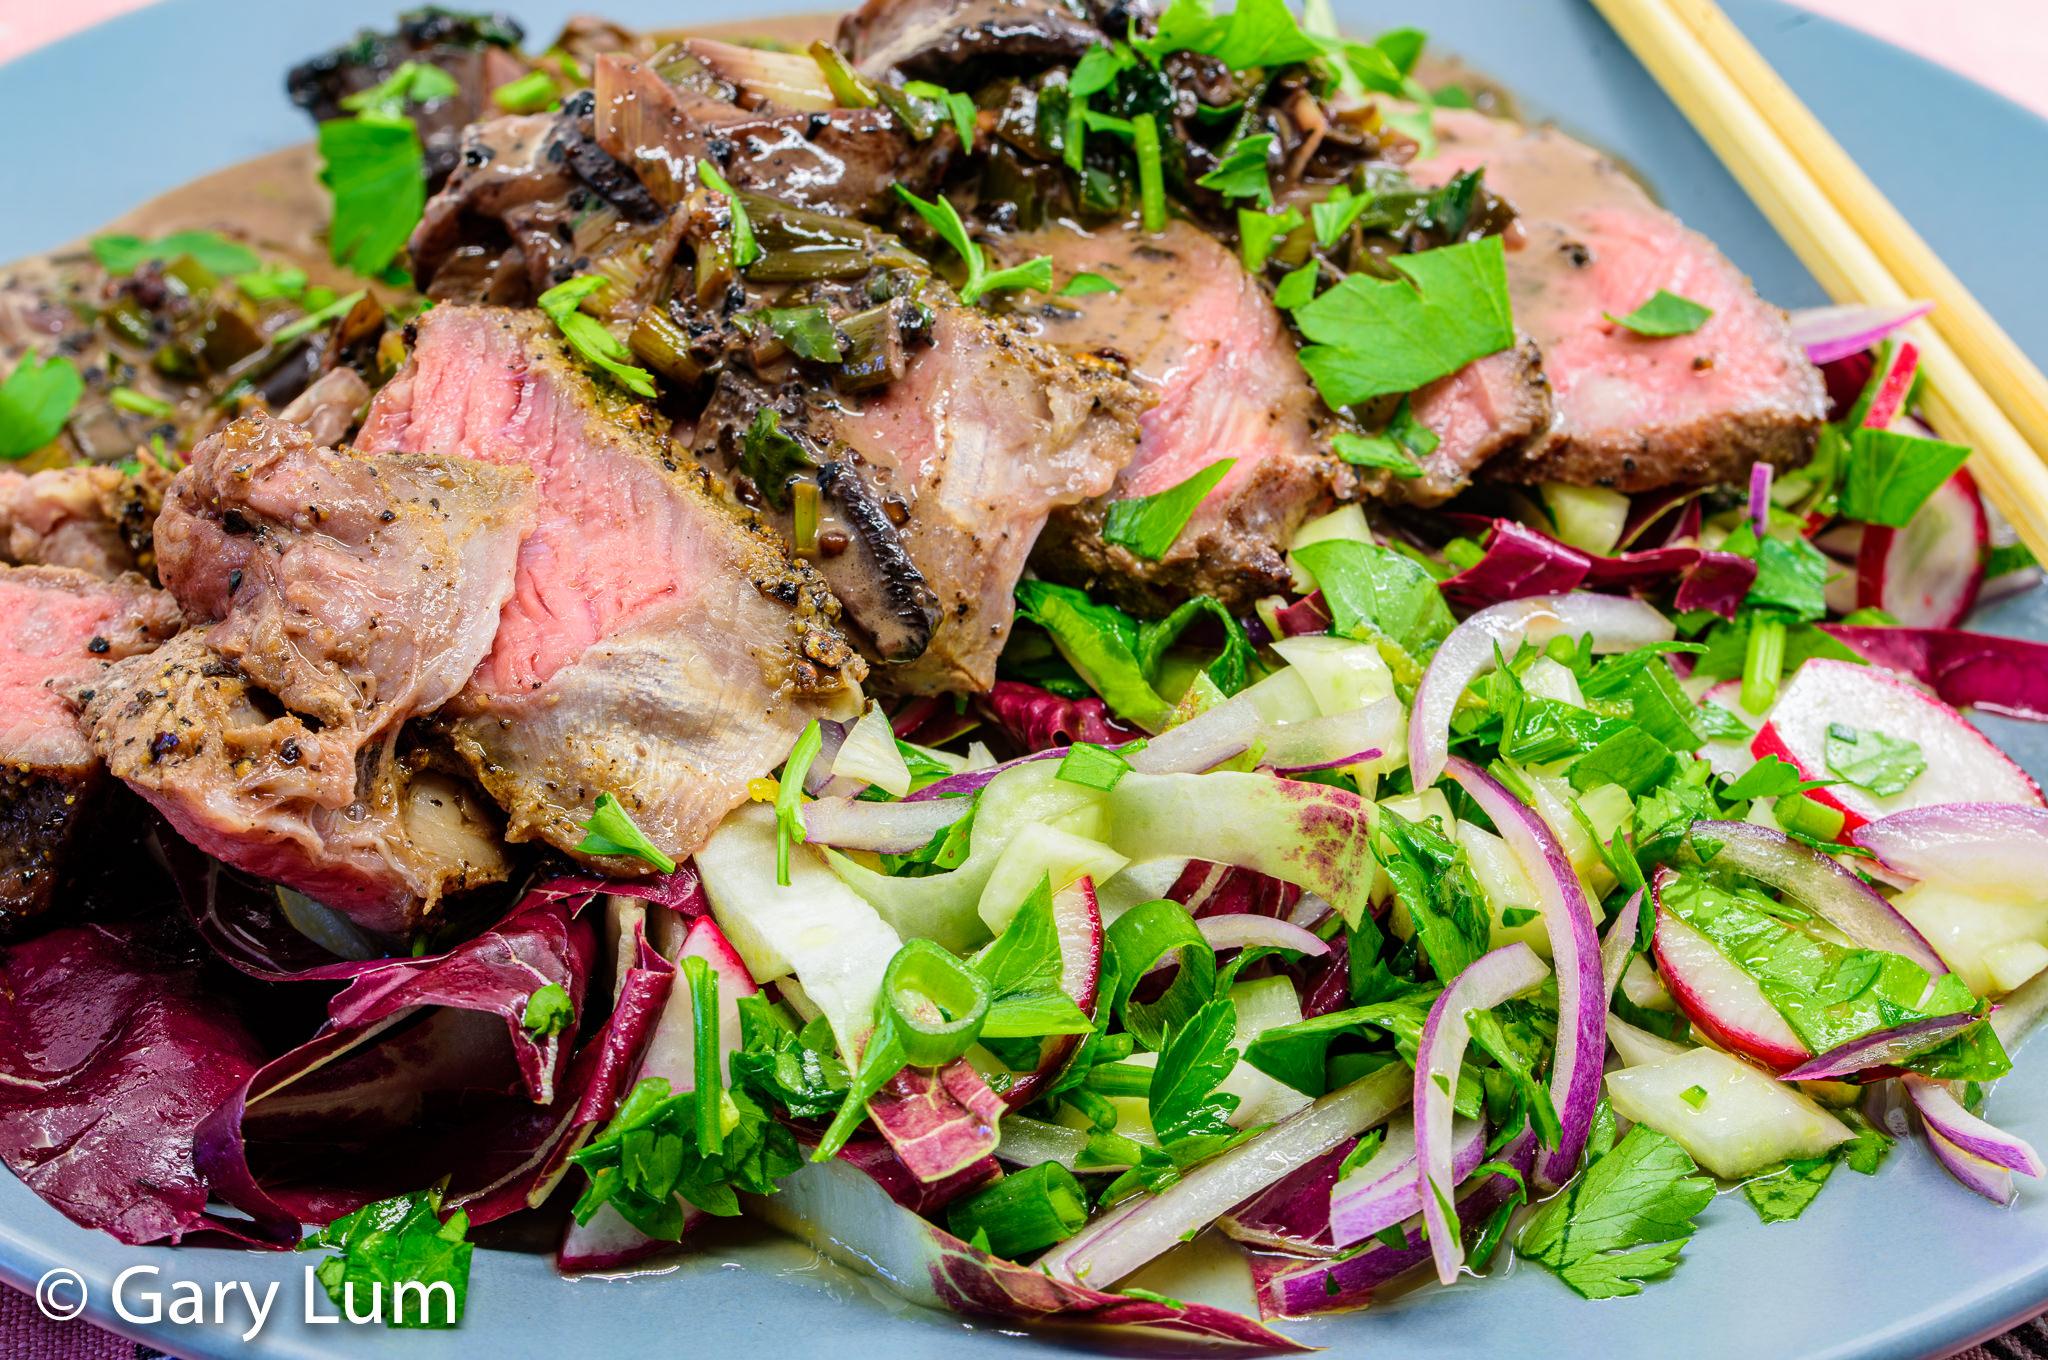 Close up. Porterhouse steak and radicchio salad. Gary Lum.